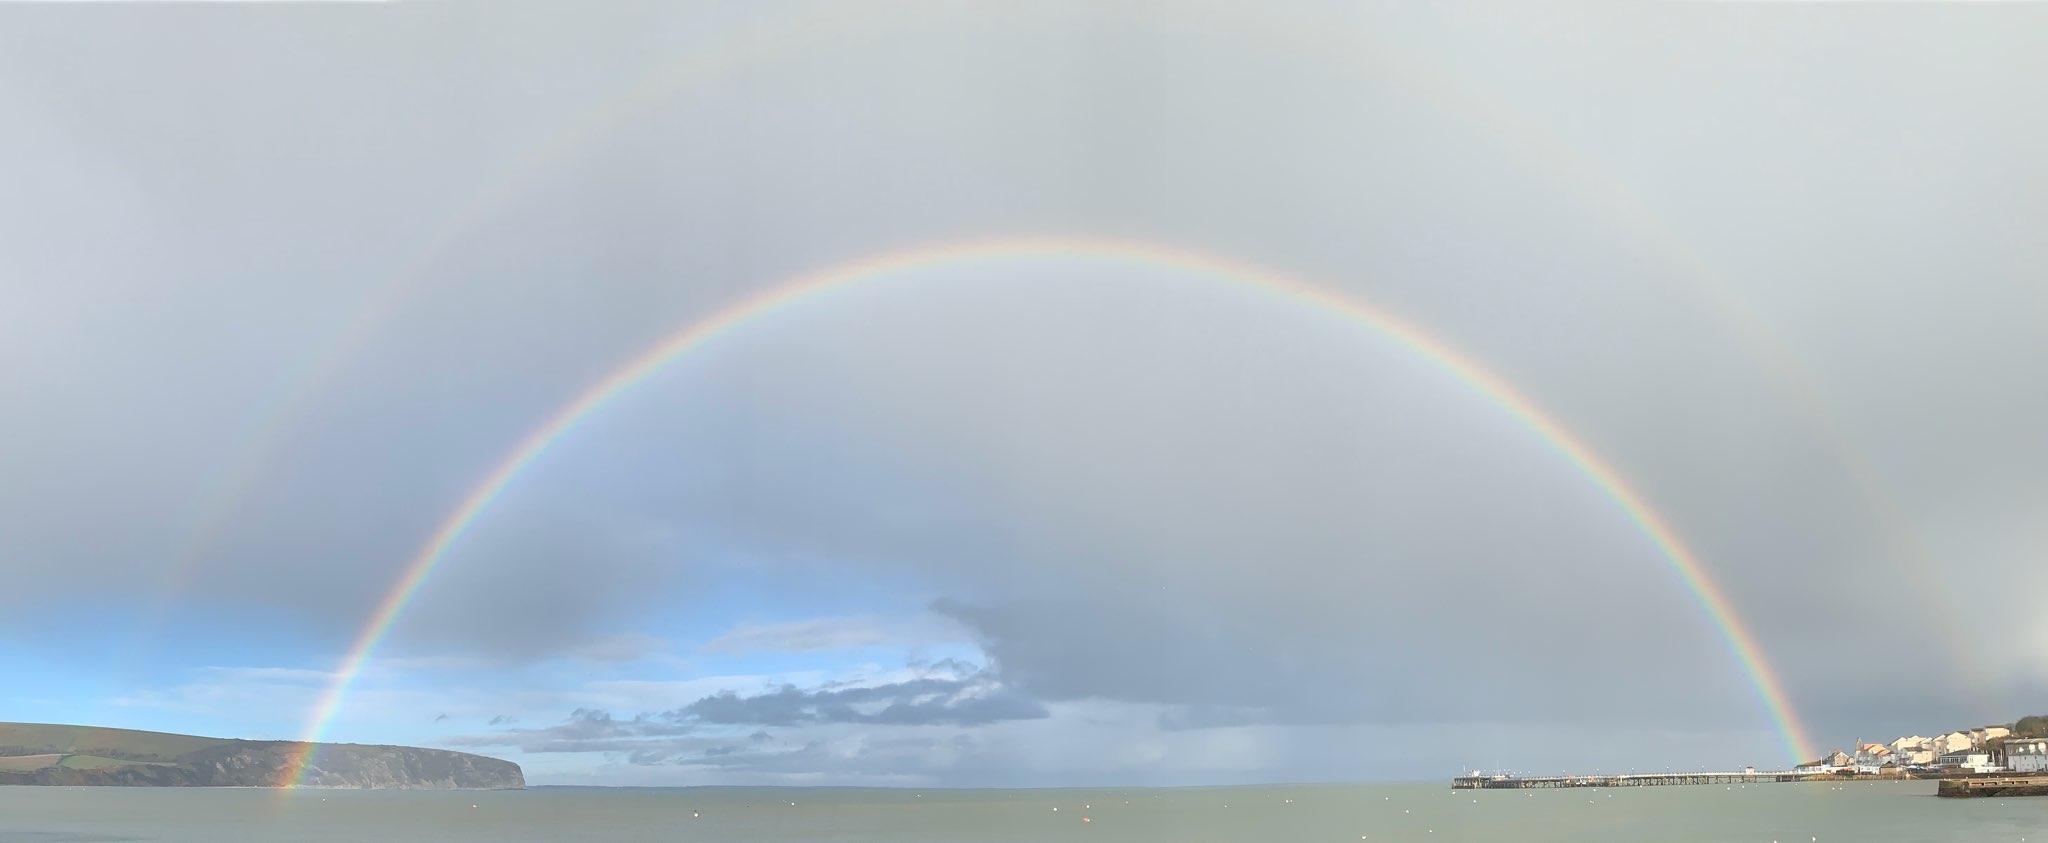 Full rainbow over Swanage Bay.